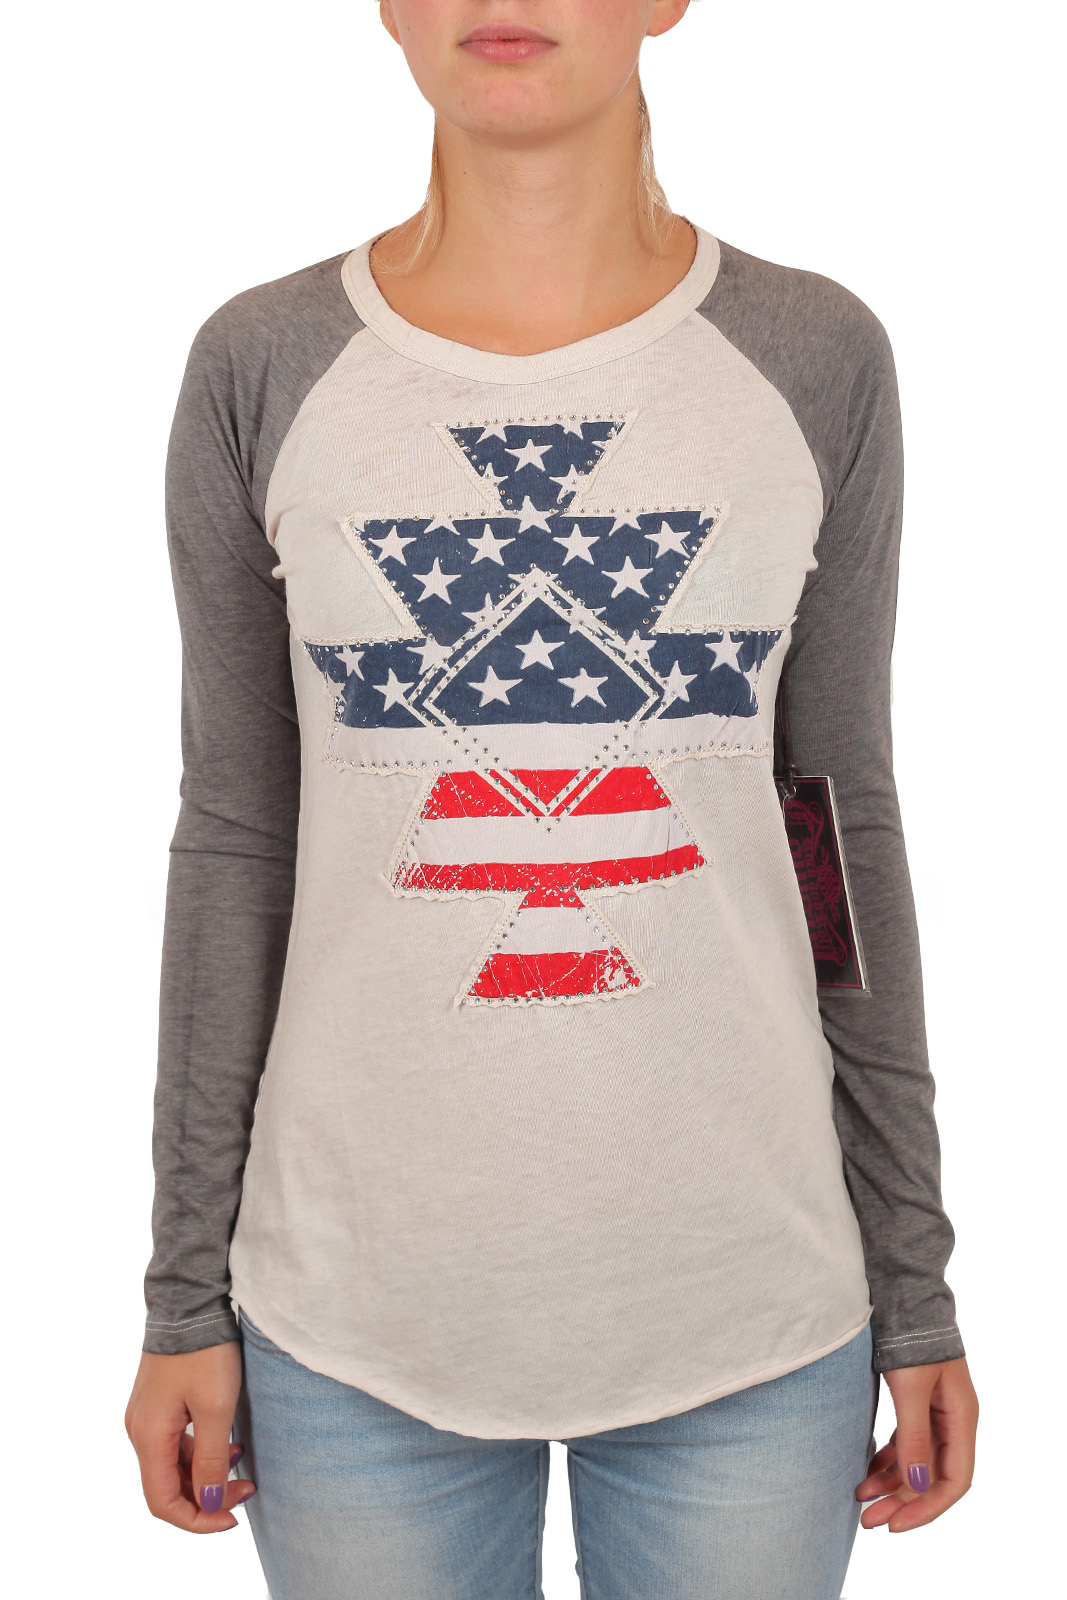 Женская футболка реглан Rock and Roll Cowgirl